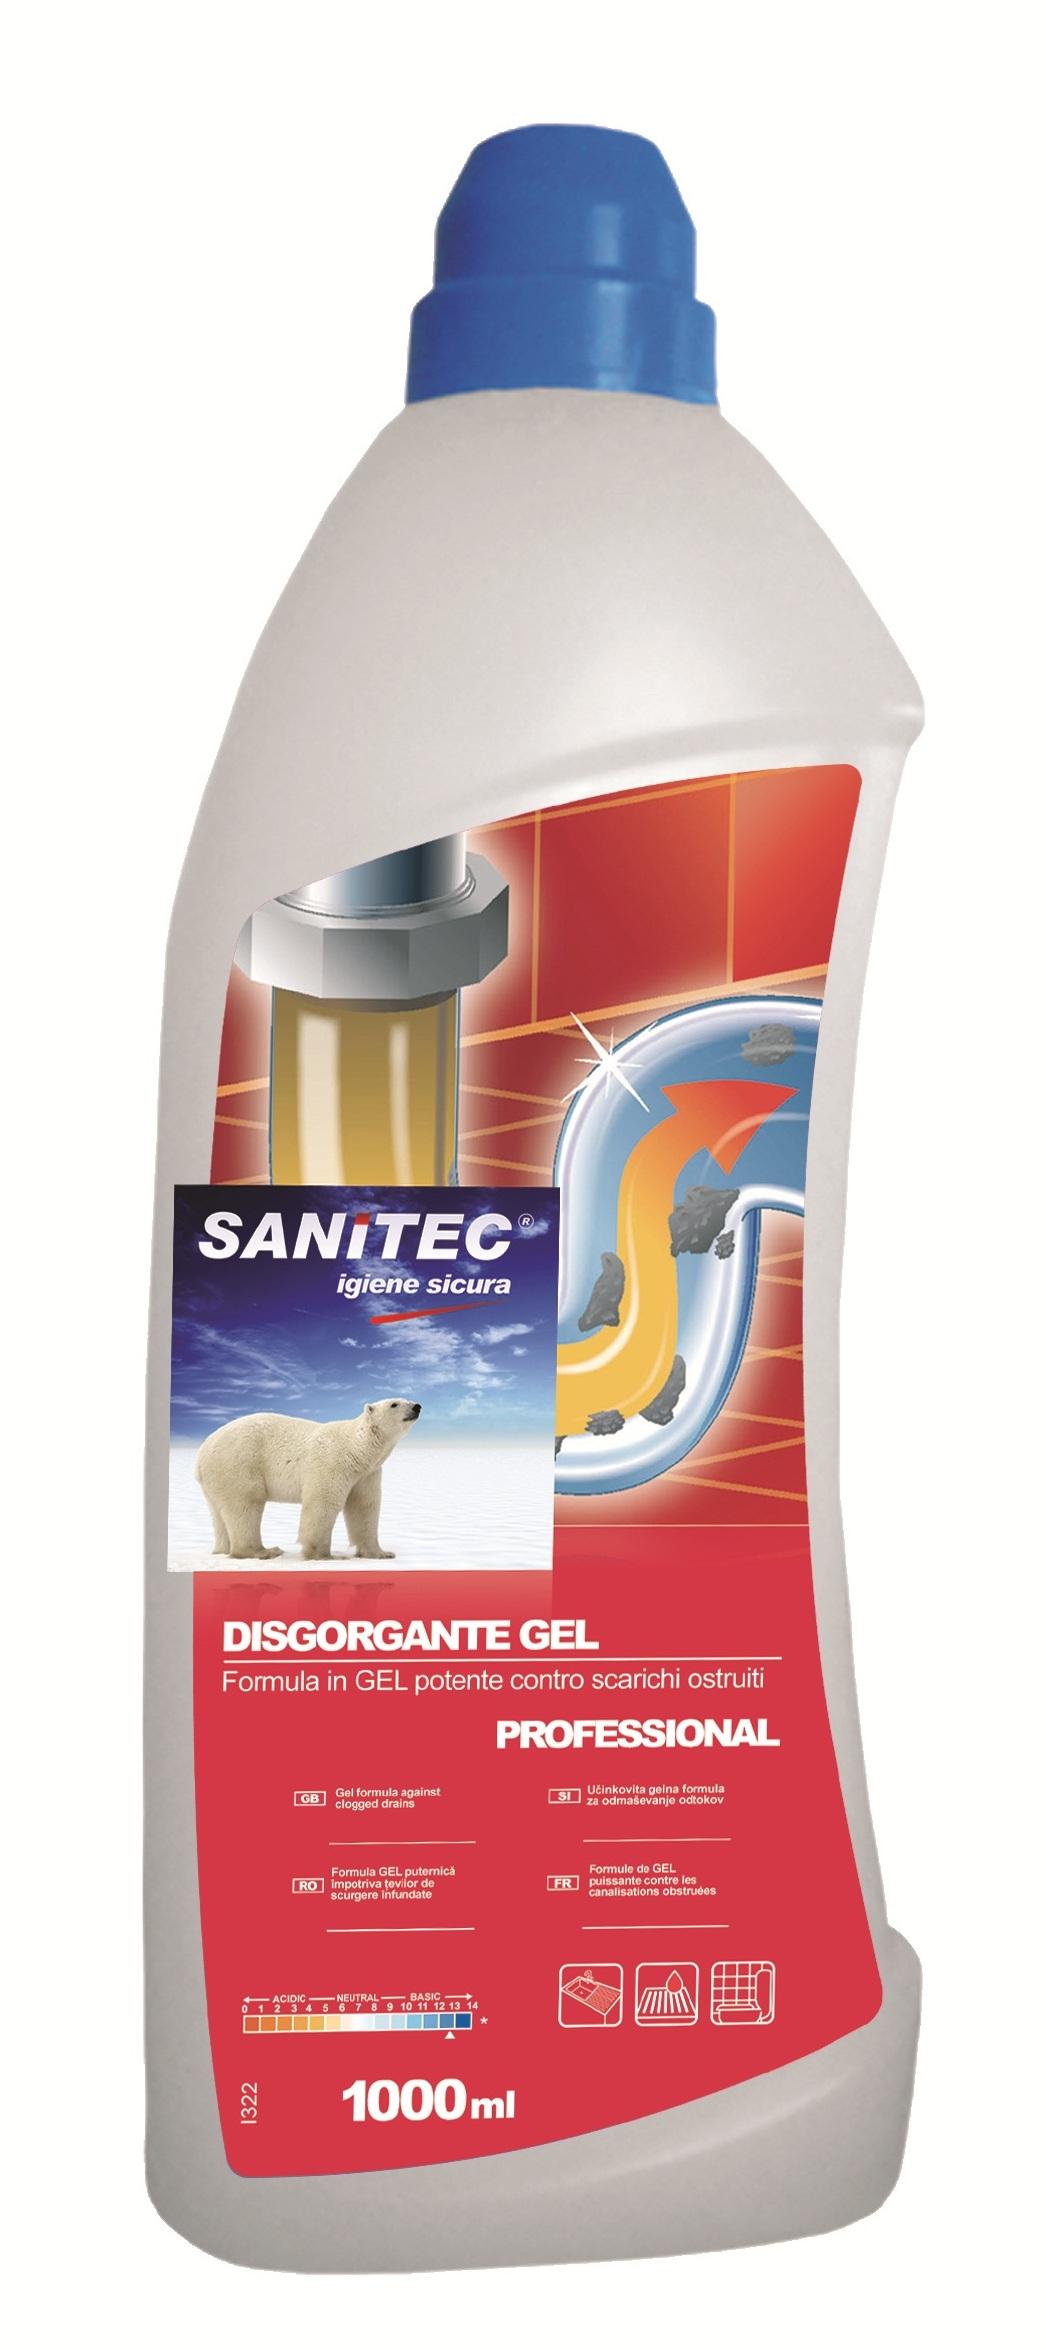 Sanitec Disgorgante Gel 1L Image